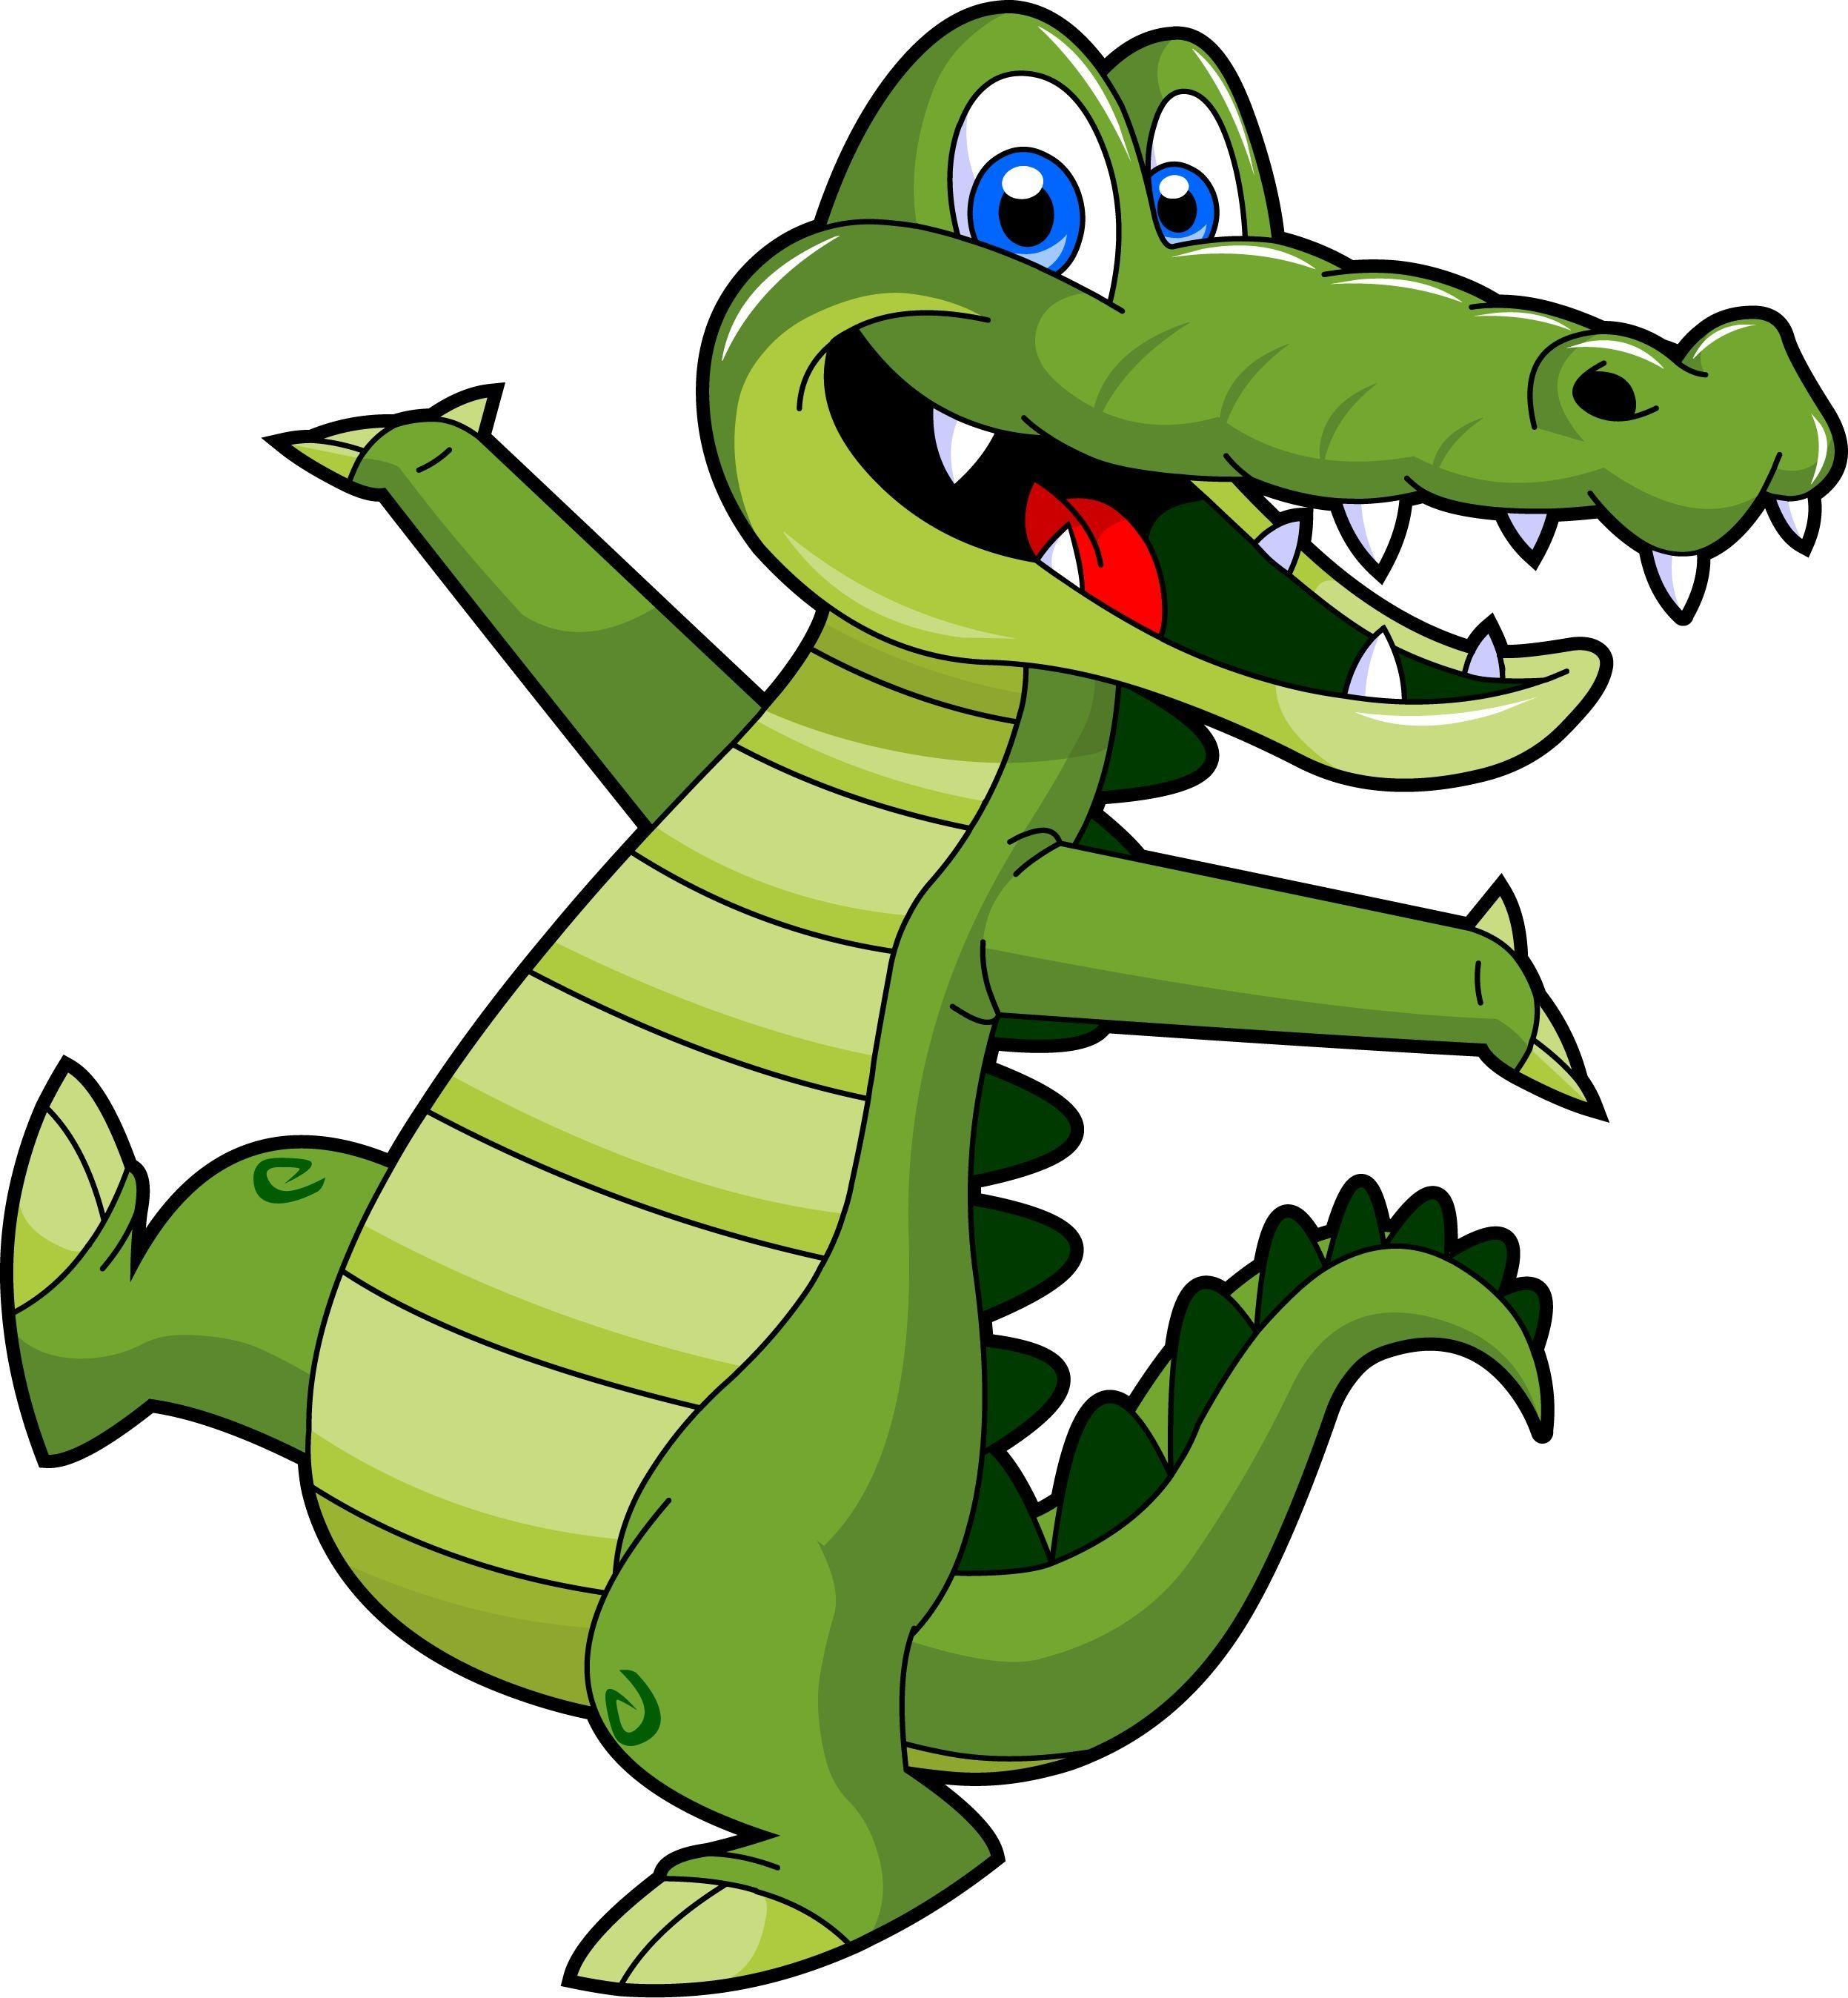 crocodile-clip-art-alligator-clip-art.jpg | Alligators ... - photo#5